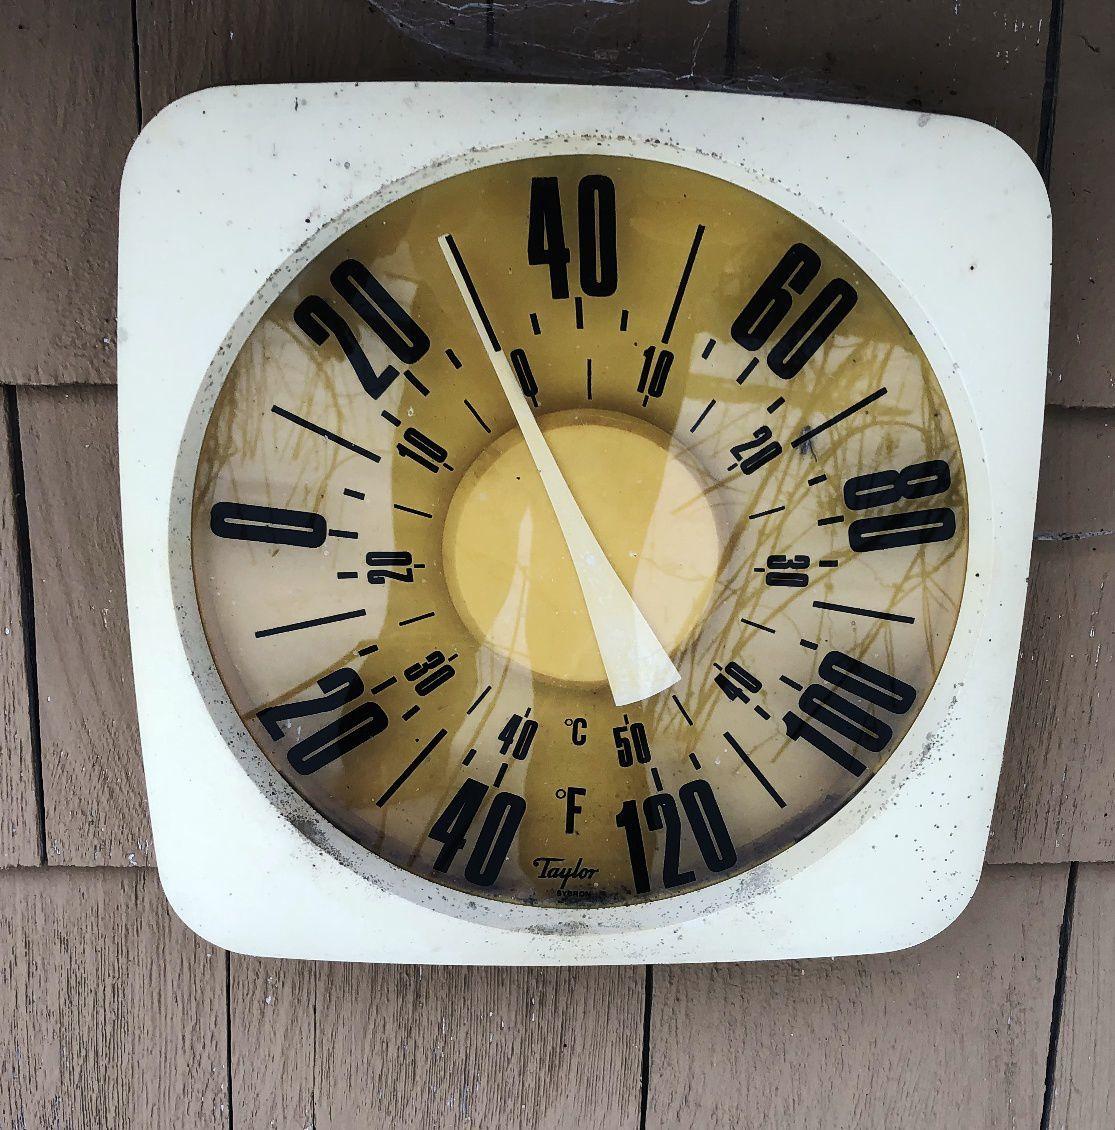 Garage thermometer